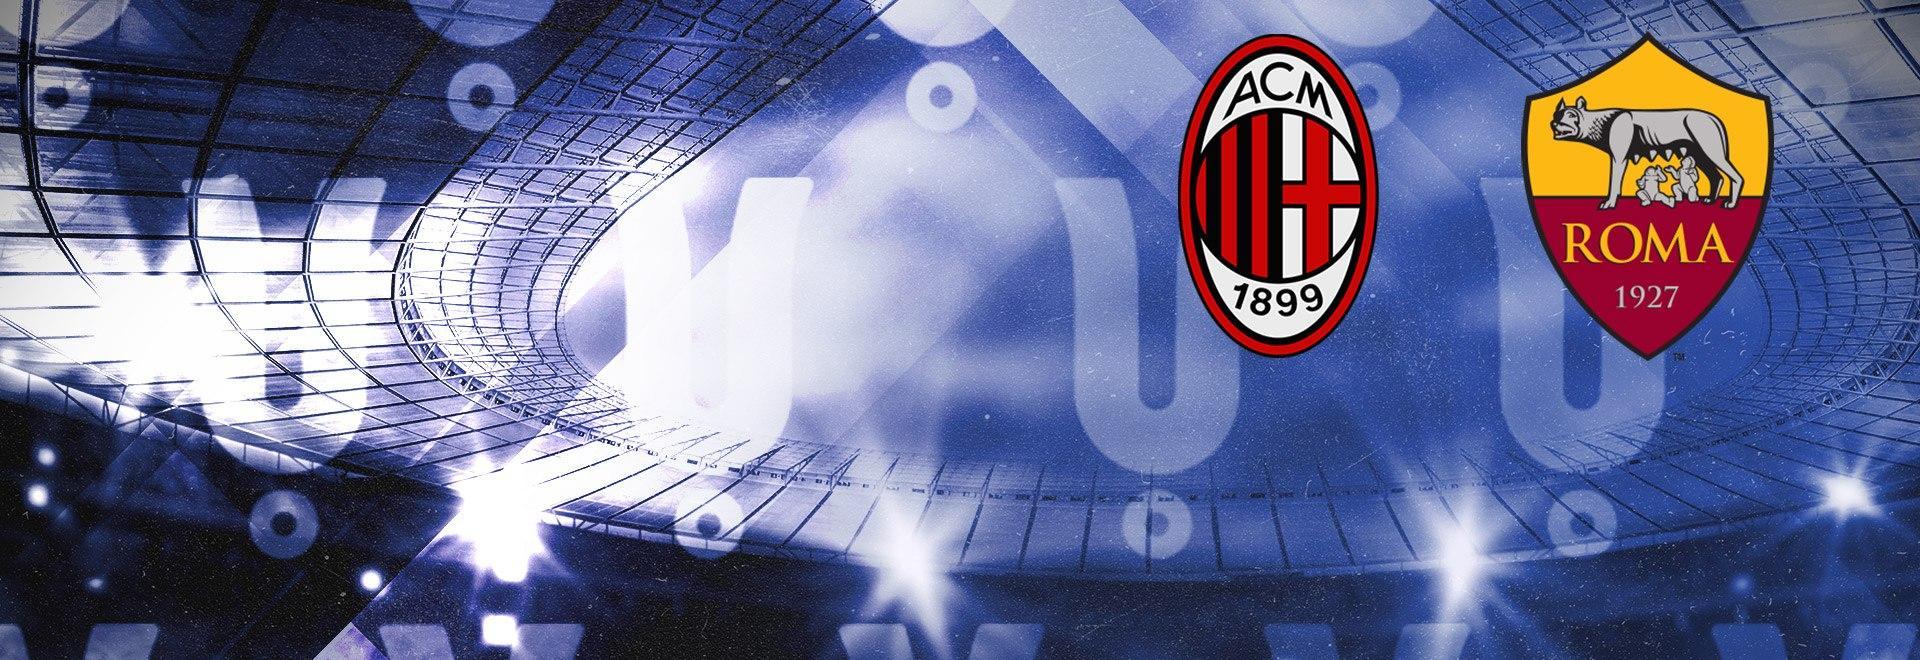 Milan - Roma. Finale